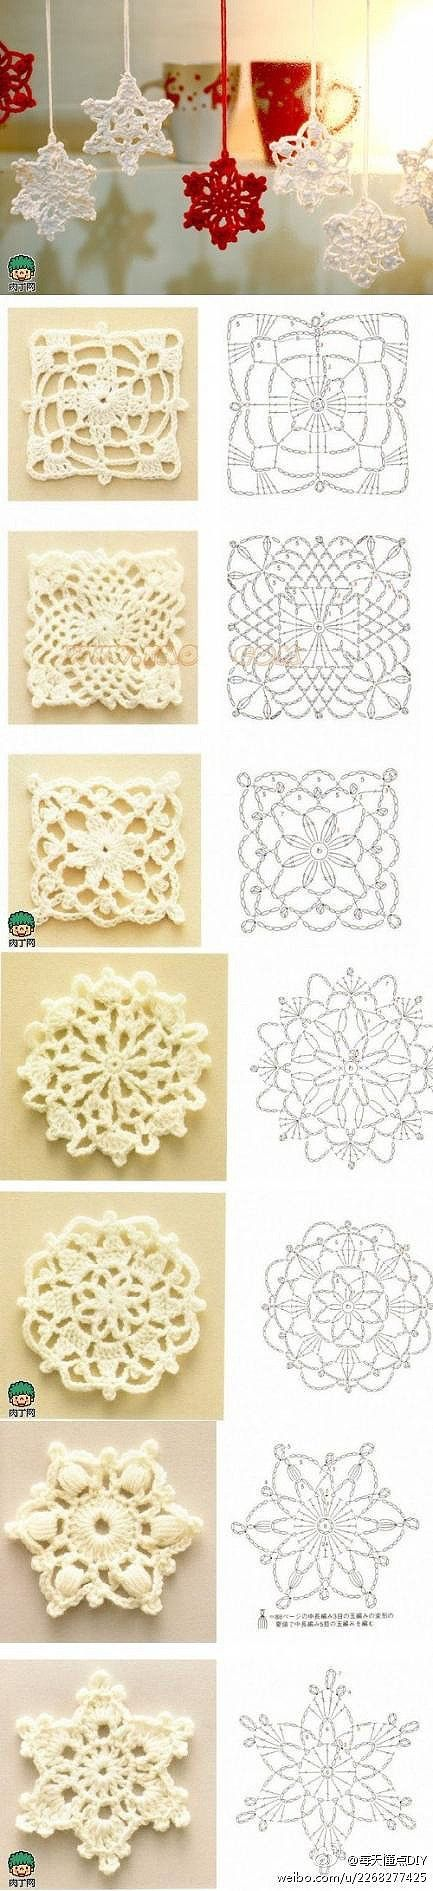 Snowflakes crochet patterns | ~crafts- crochet | Pinterest ...